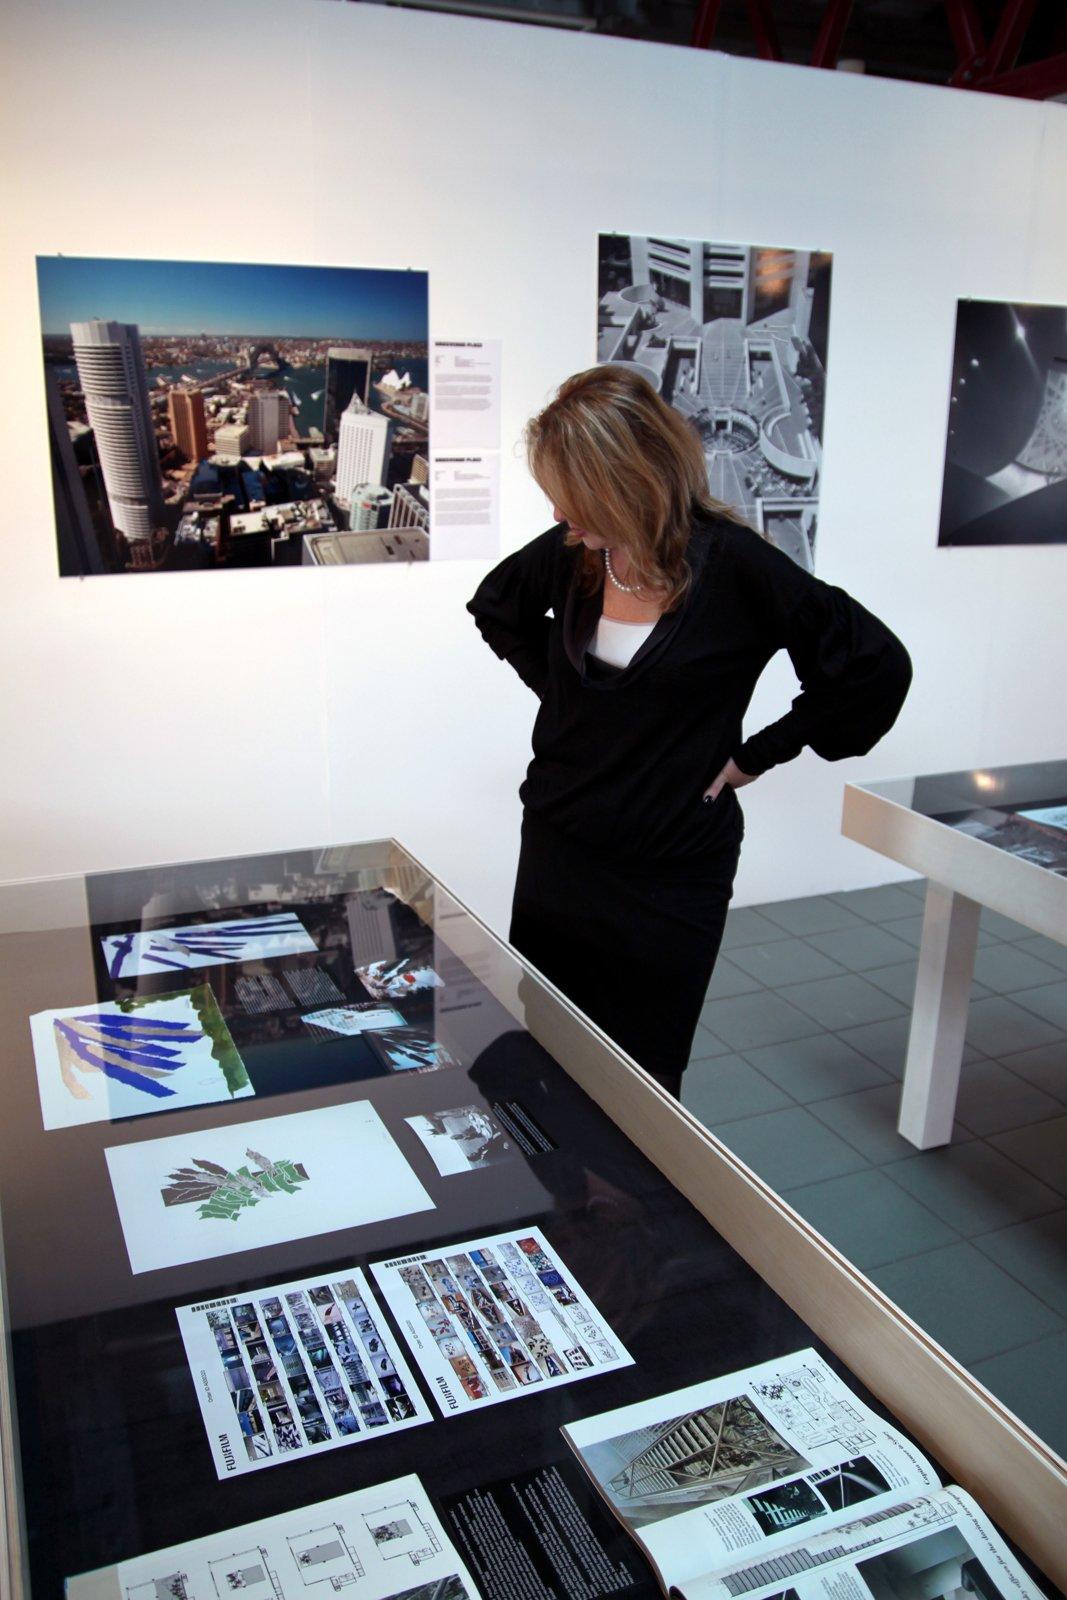 Harry Seidler exhibition at Museum of Estonian Architecture, Tallinn, Estonia. Photo by: Vladimir Belogolovsky  Photo 11 of 12 in Harry Seidler: Architecture, Art, and Collaborative Design